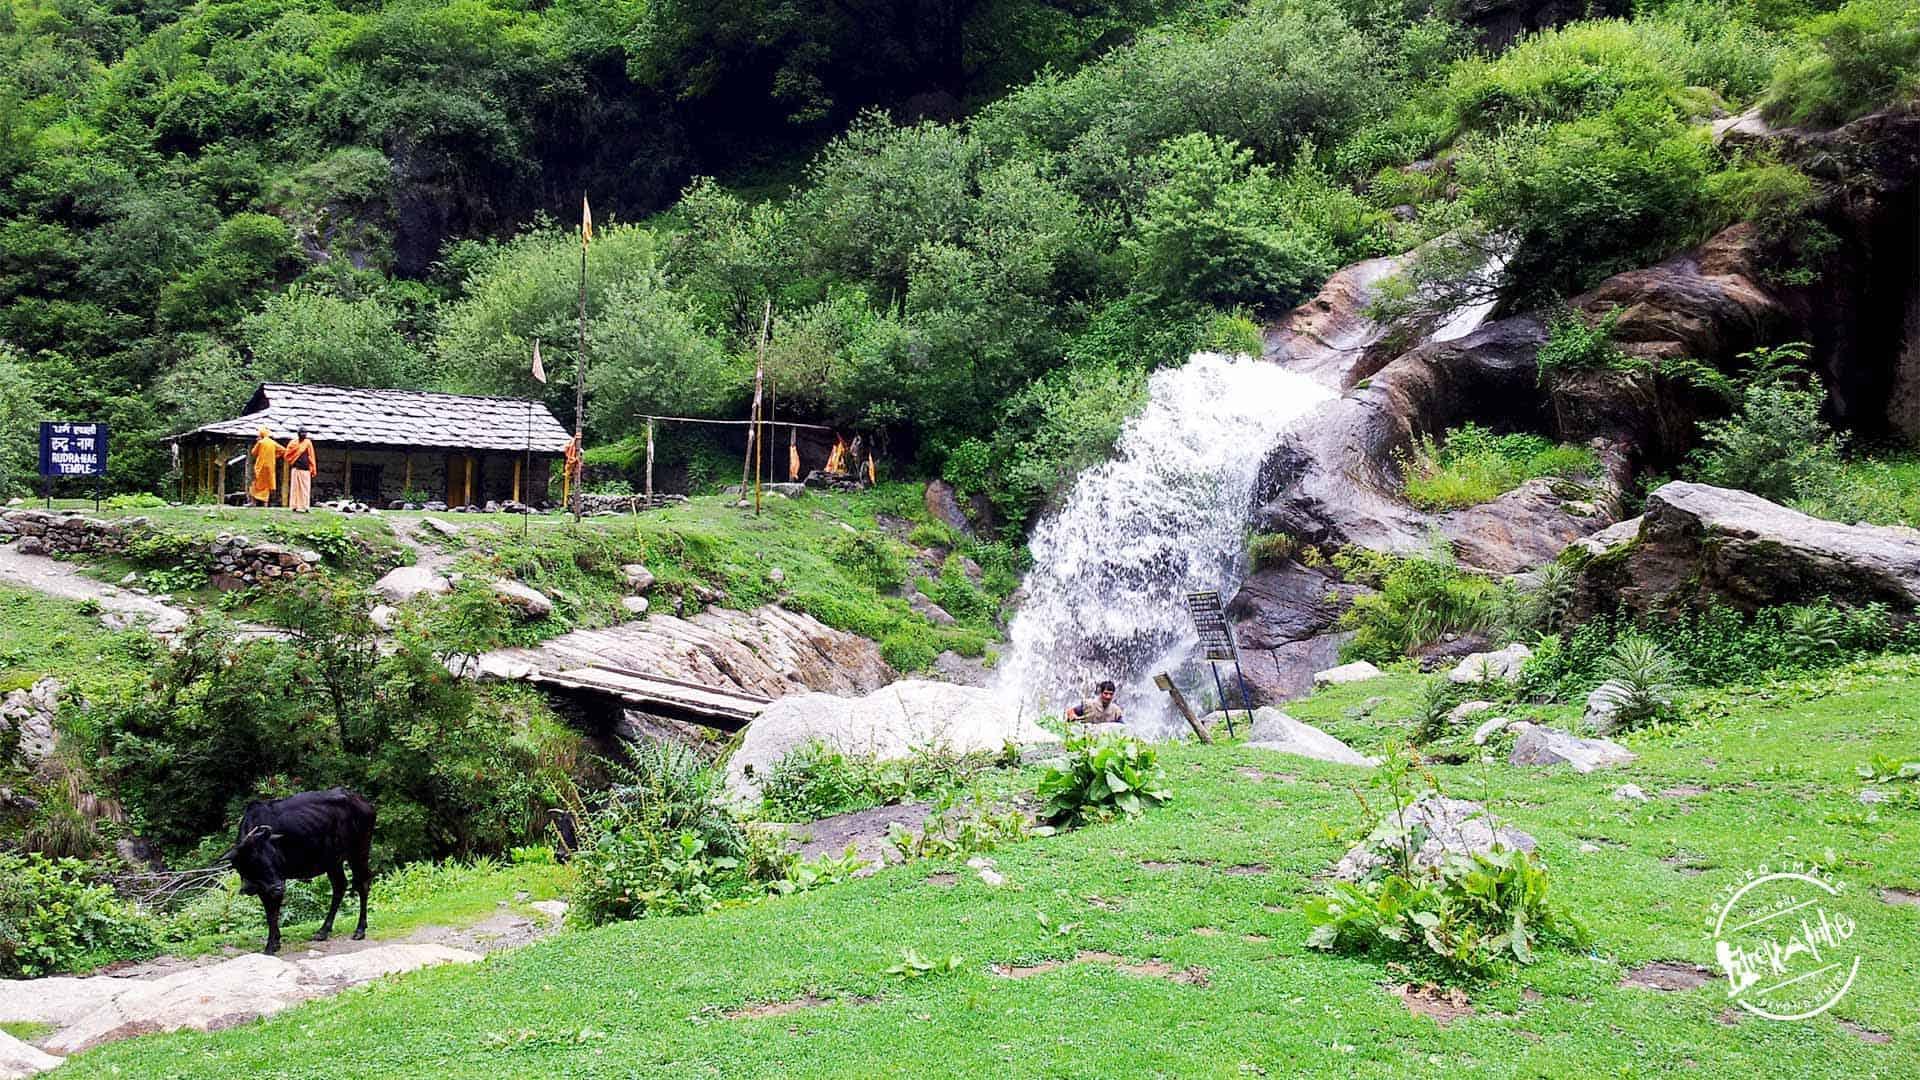 Kheerganga Trek - Rudranag waterfall